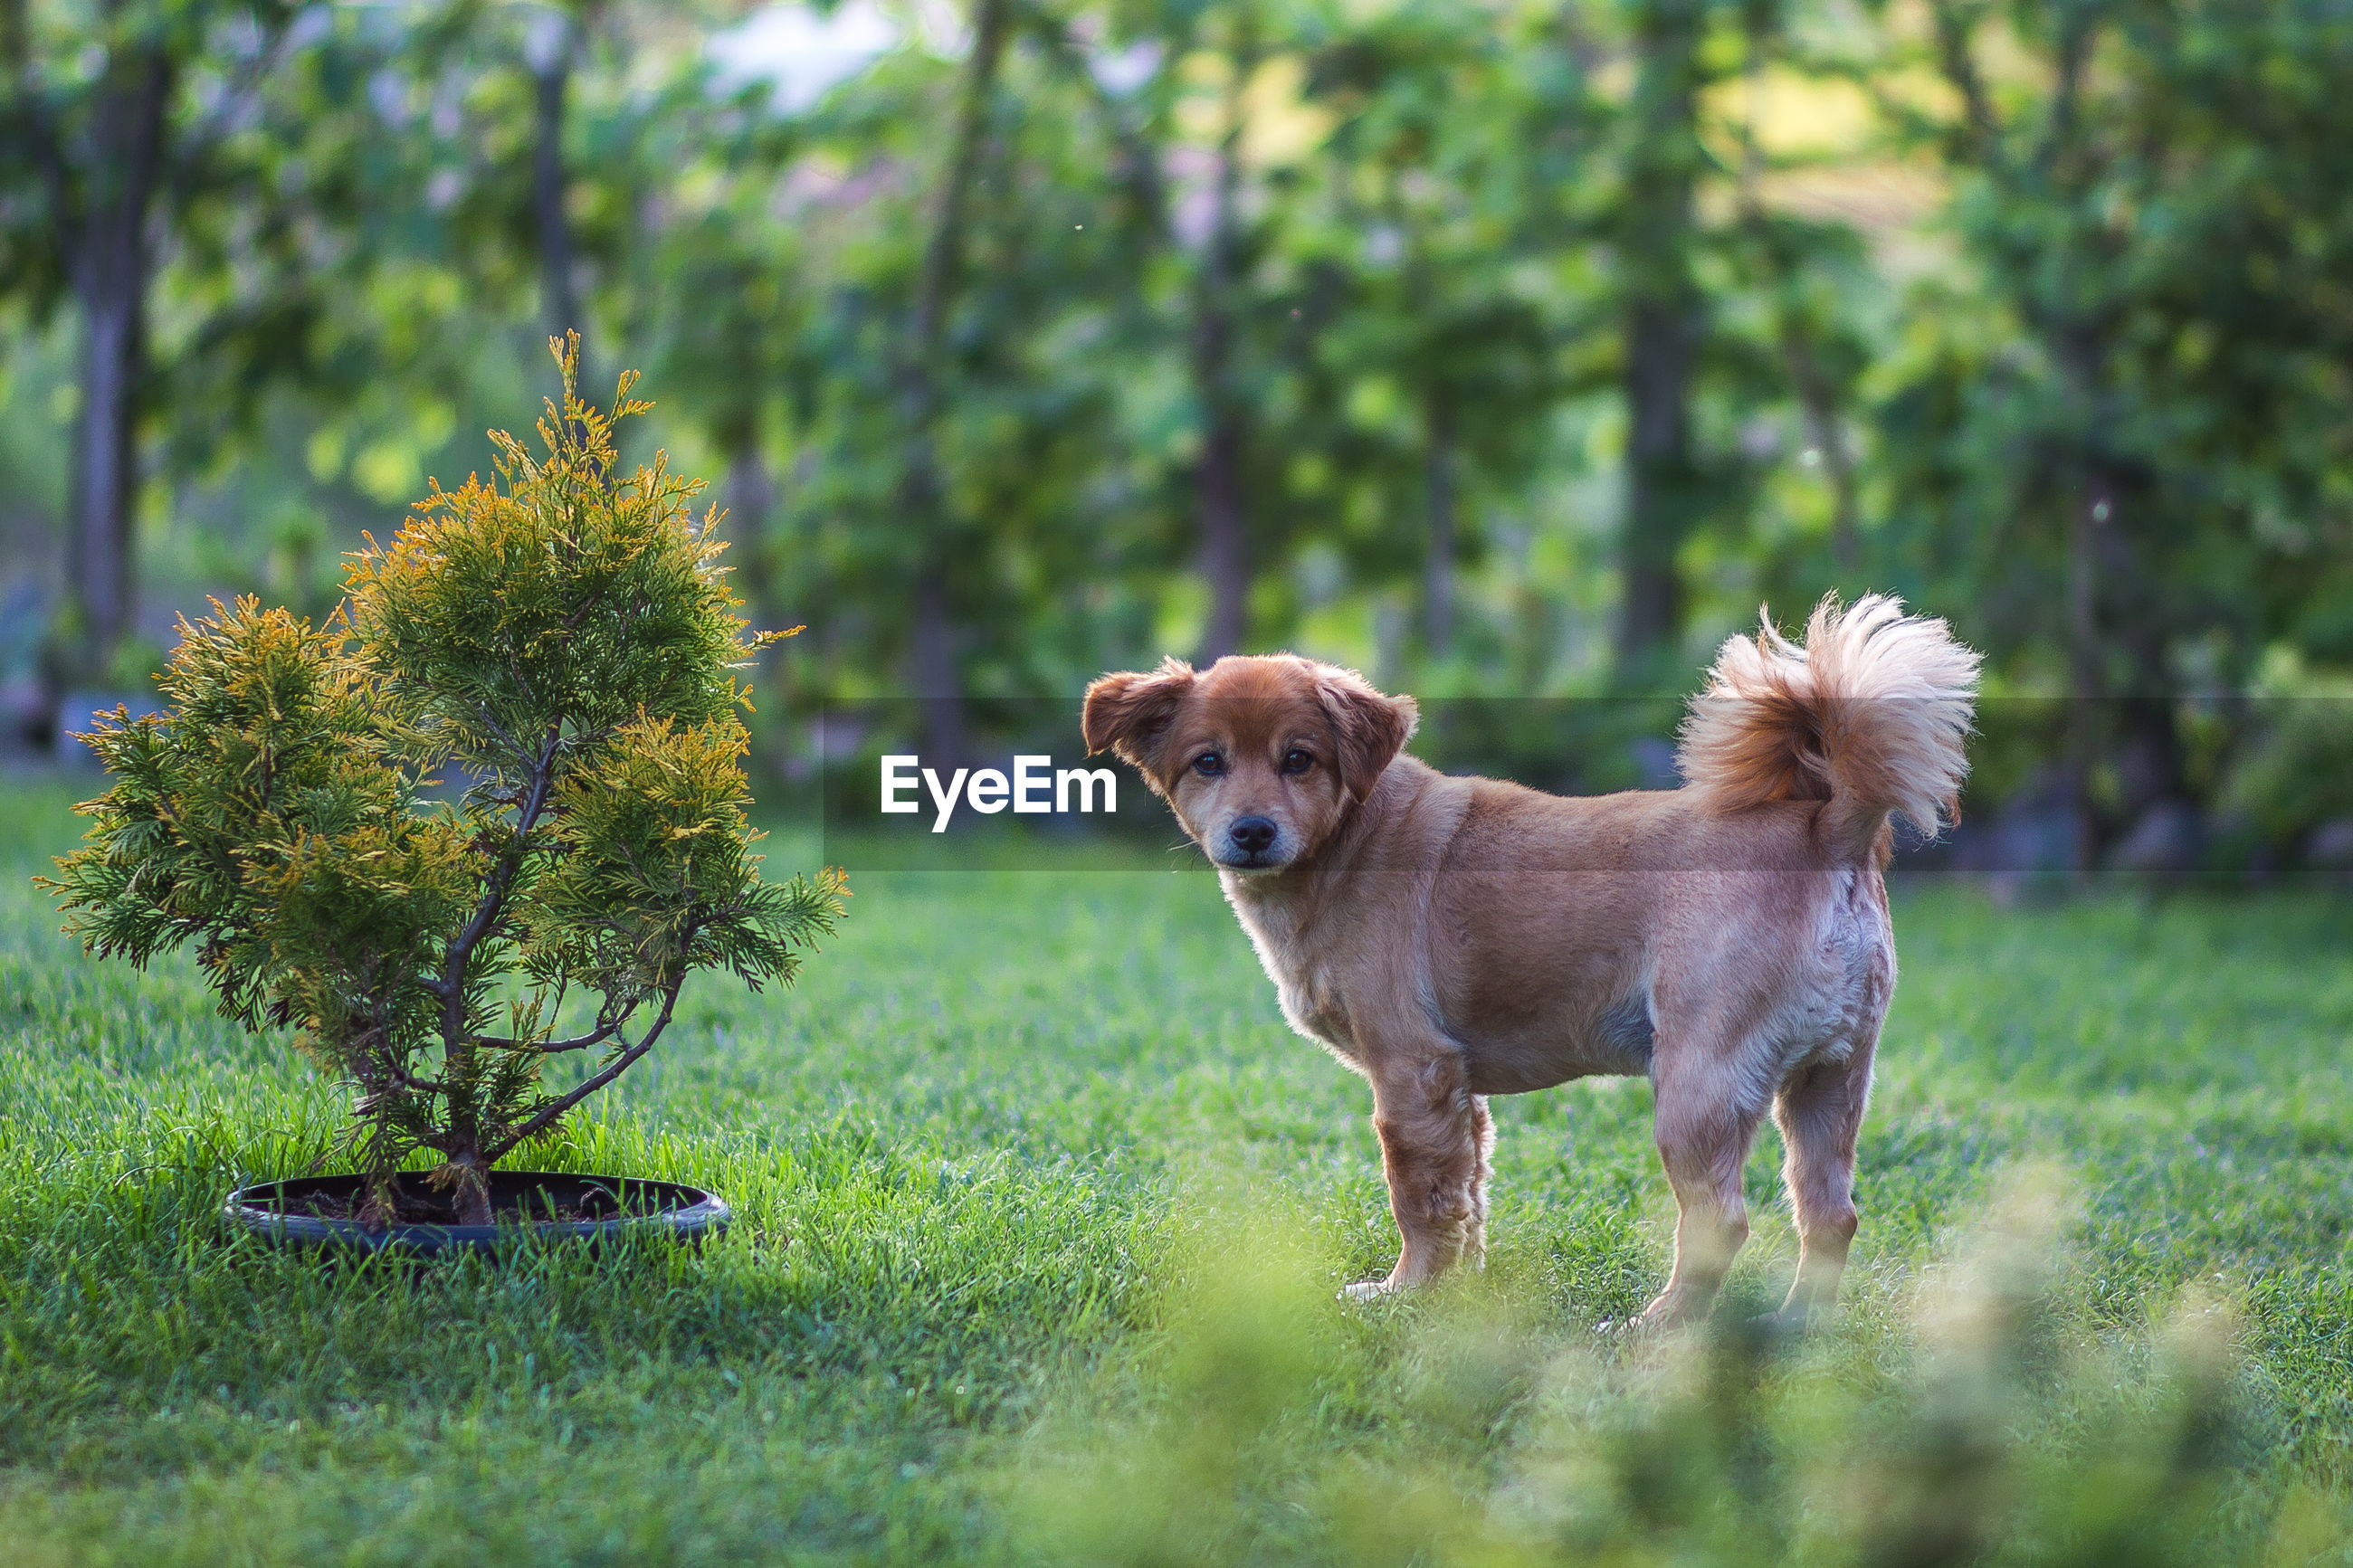 Portrait of dog standing on grassy land